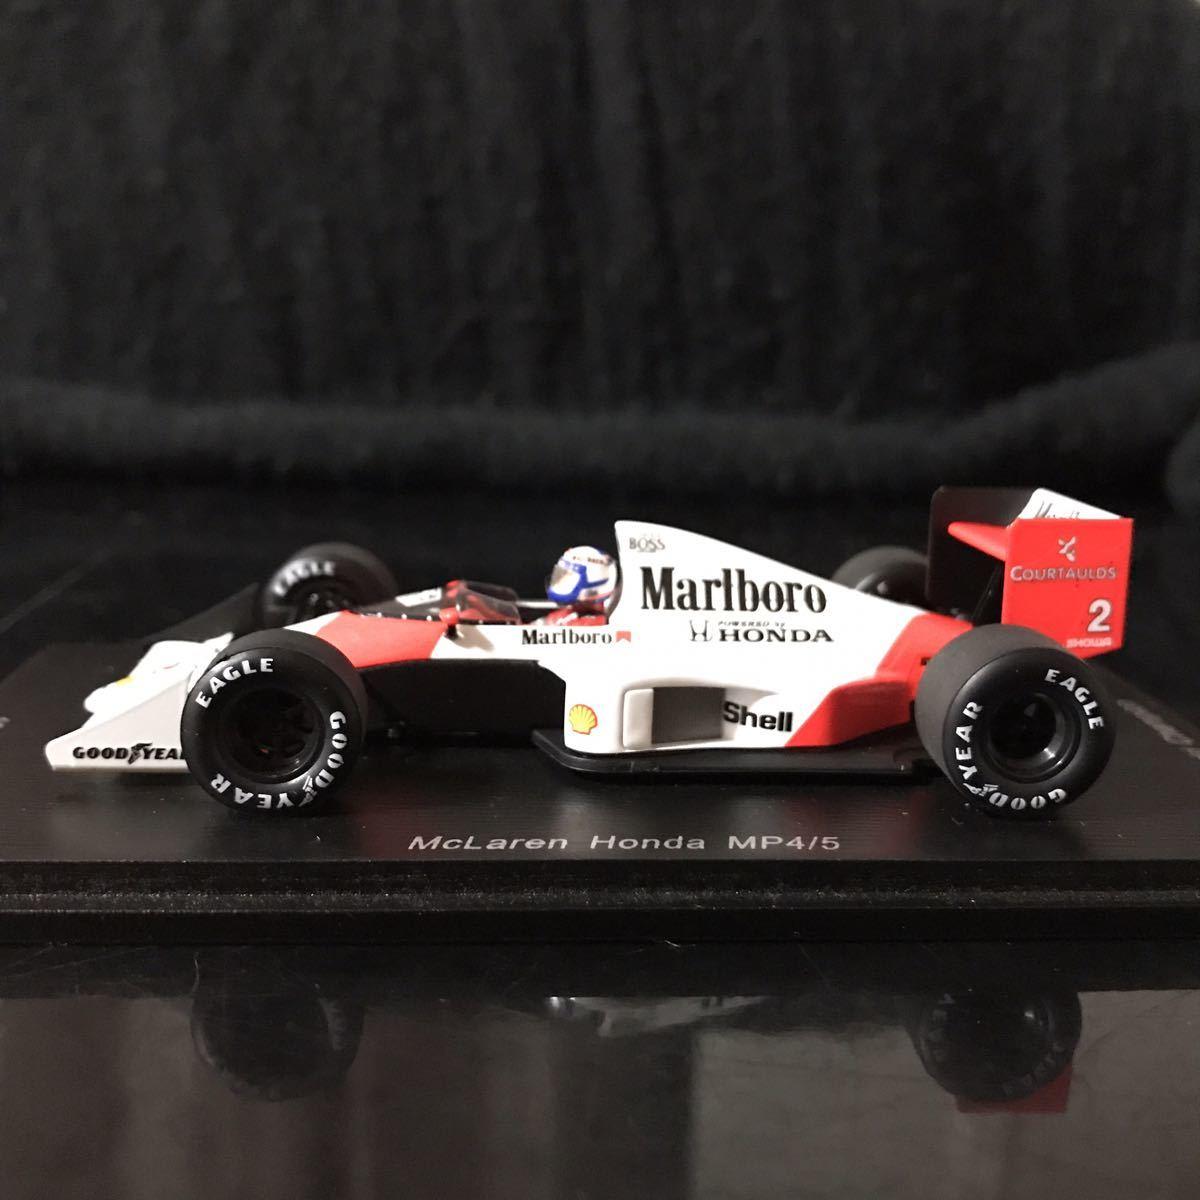 ES別注 スパーク 1/43 ホンダ マールボロ マクラーレン MP4/5 #2 A.プロスト 1989 ワールドチャンピオン マルボロ仕様_画像4